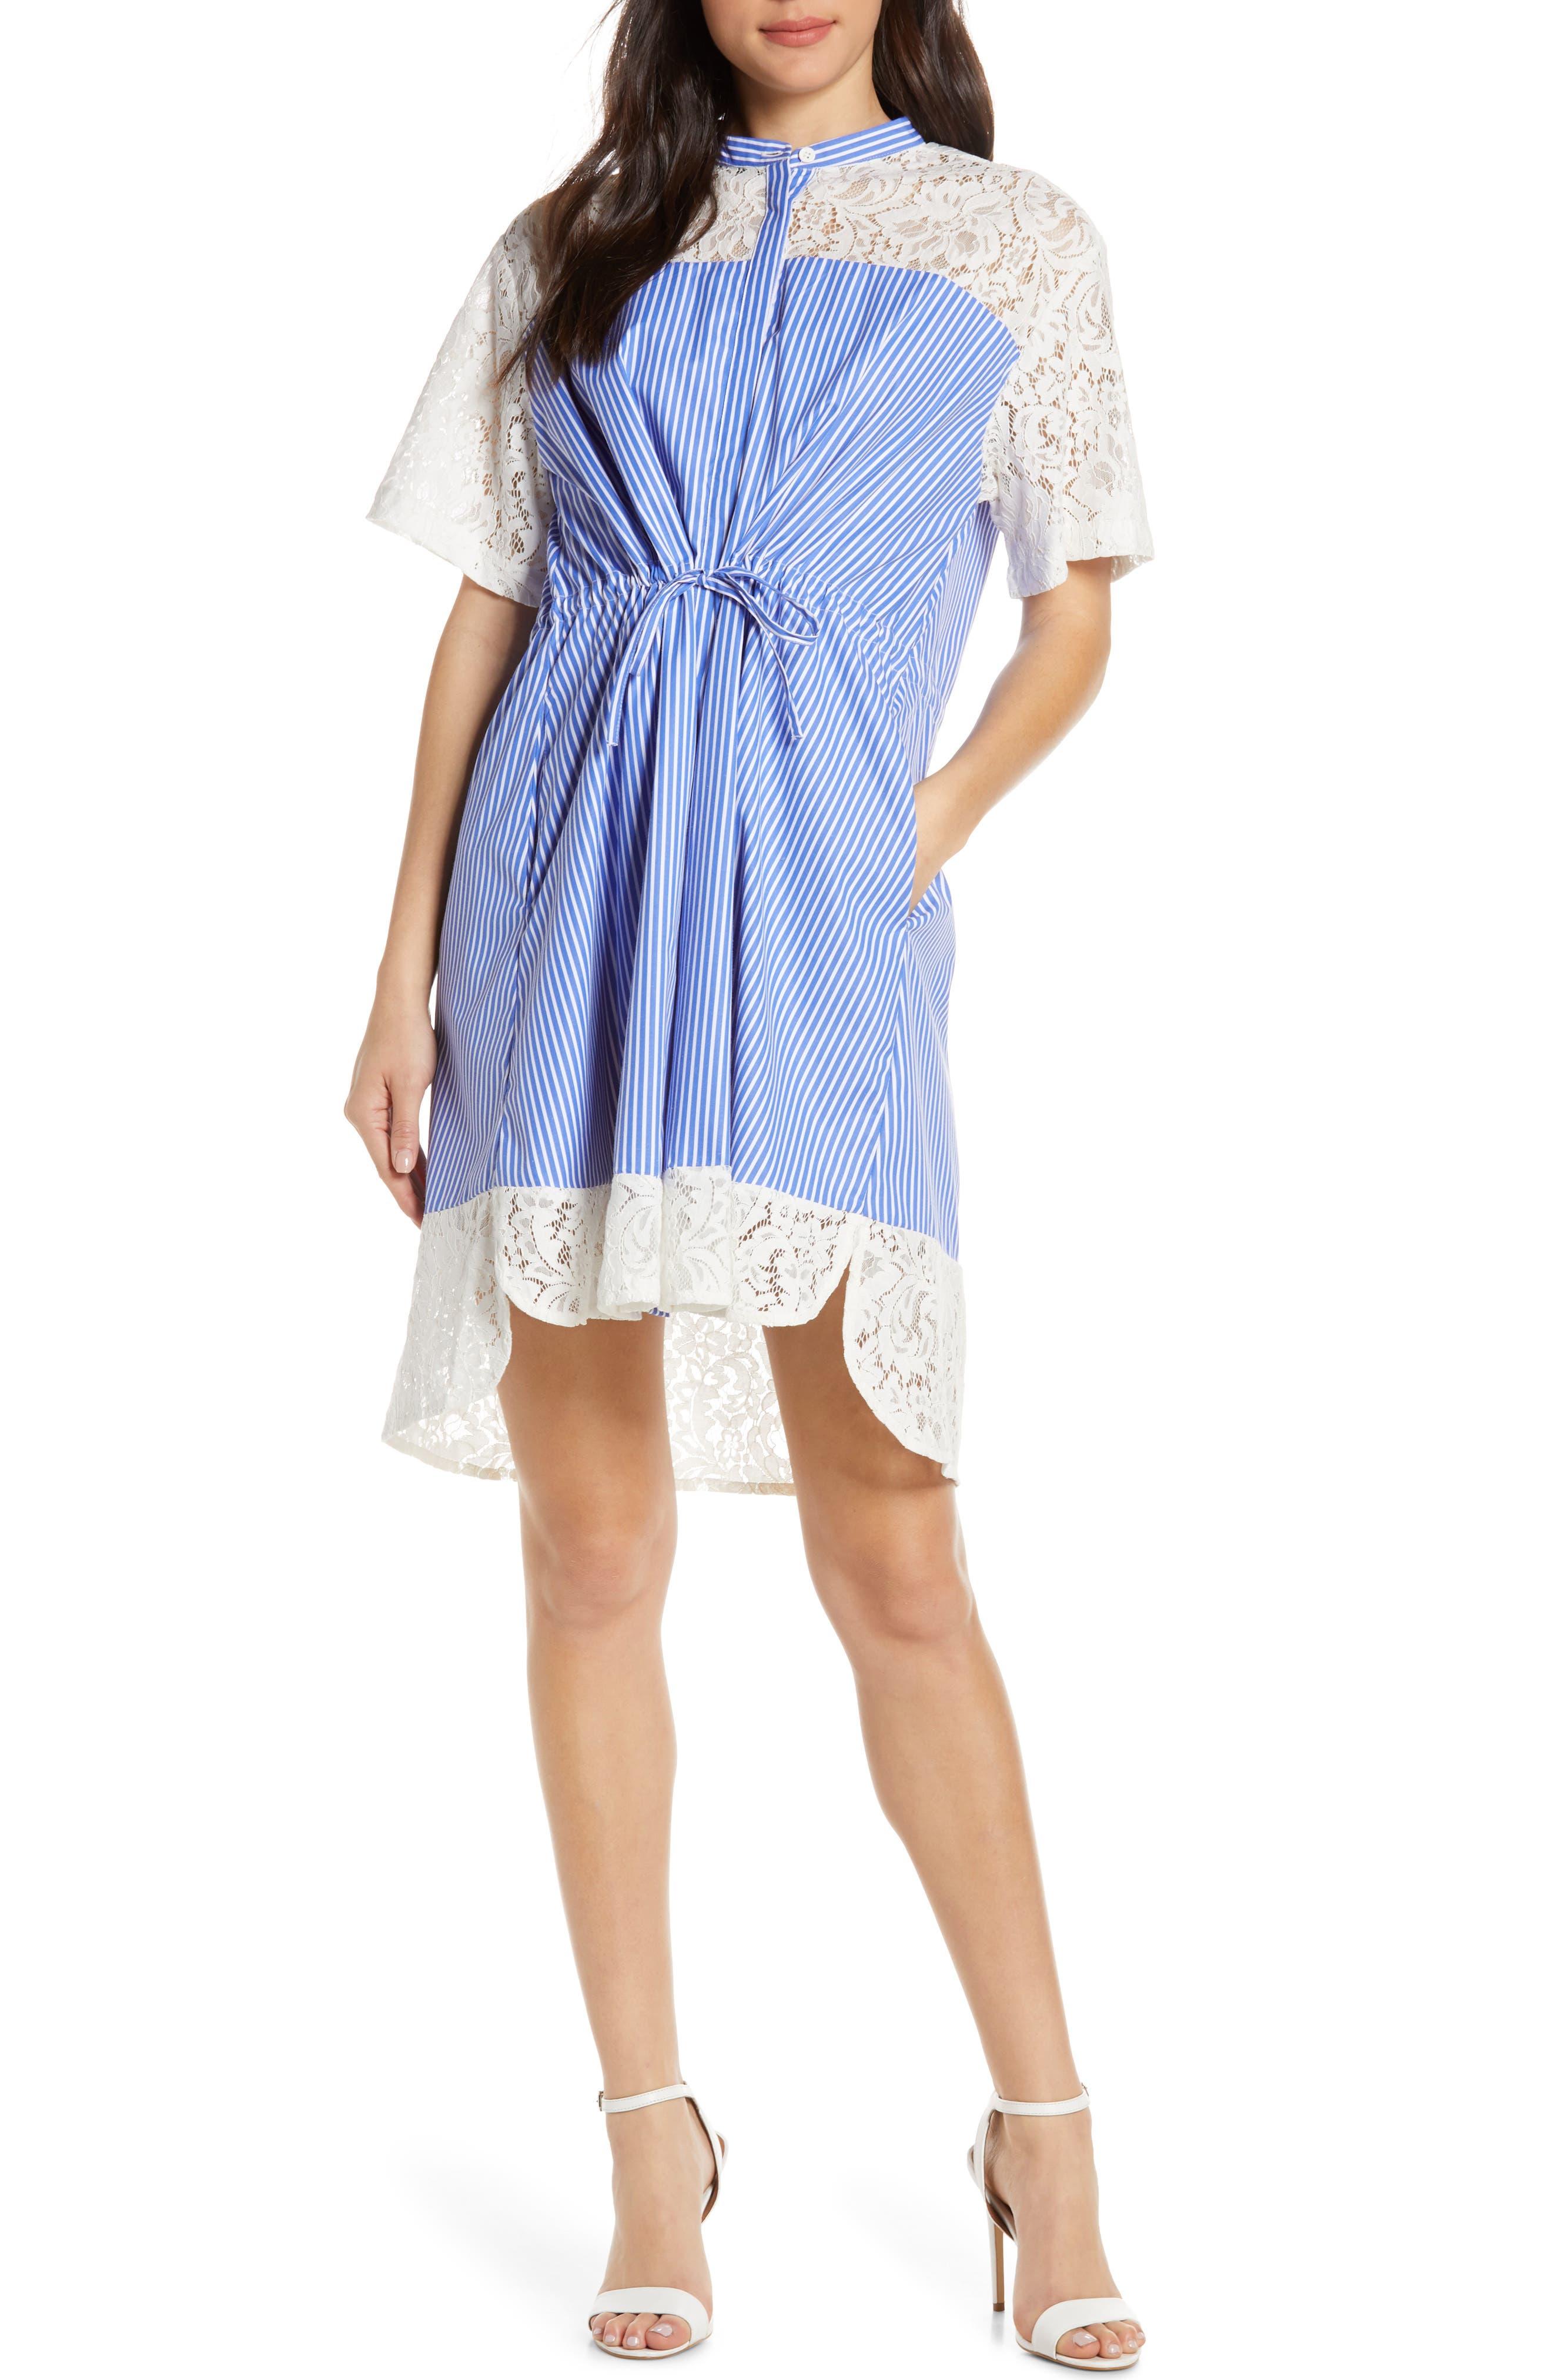 French Connection Adena Mix Tie Waist Dress, Blue